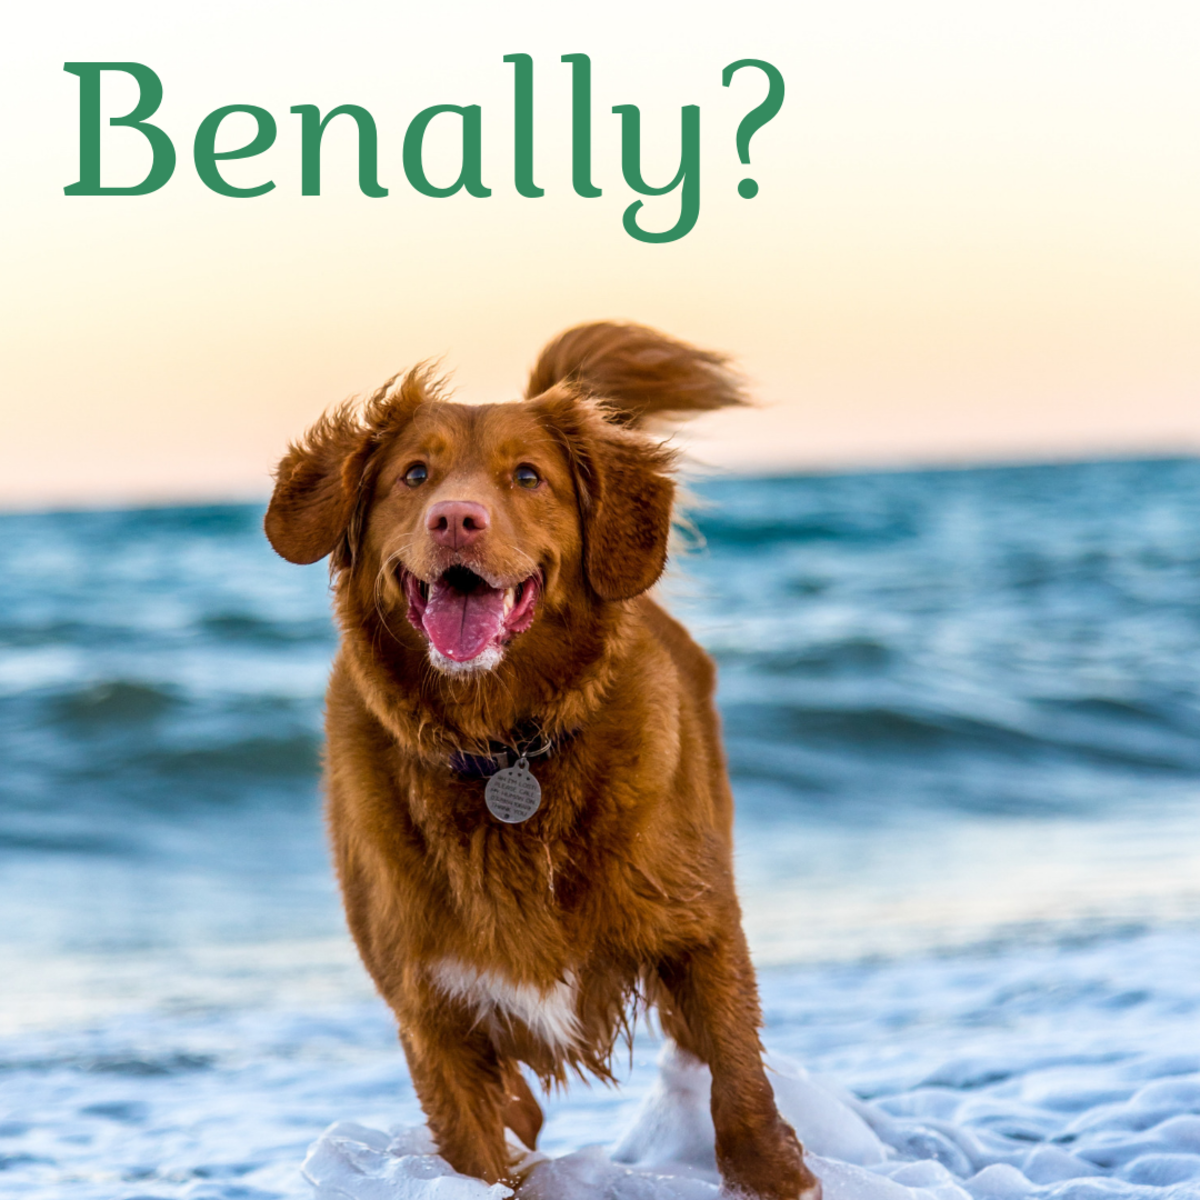 Benally